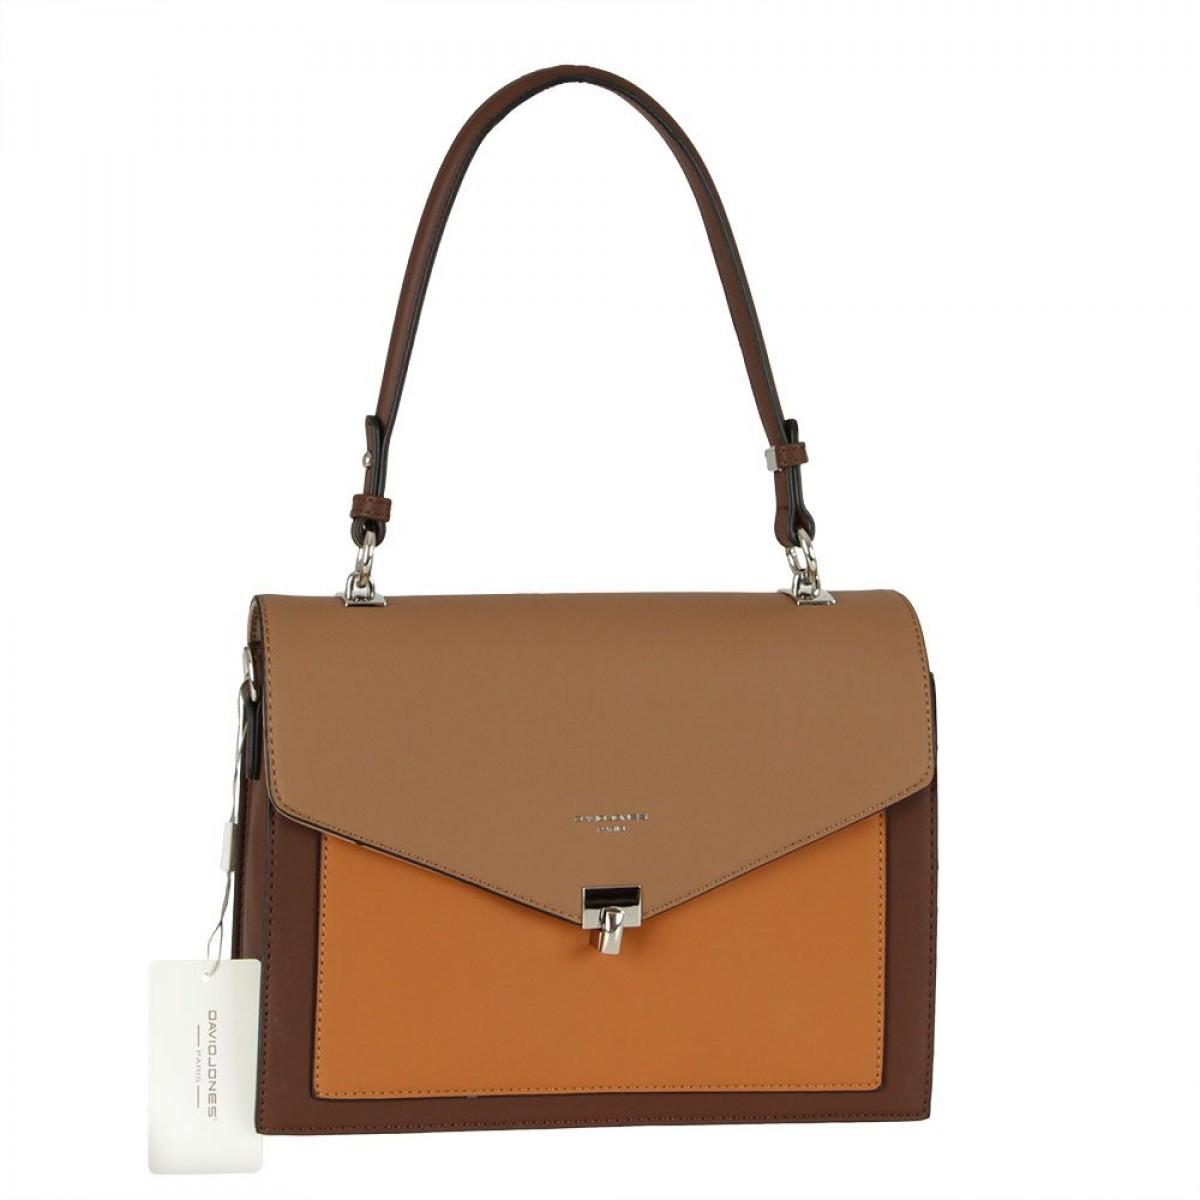 Жіноча сумка David Jones 6409-2 D.BROWN